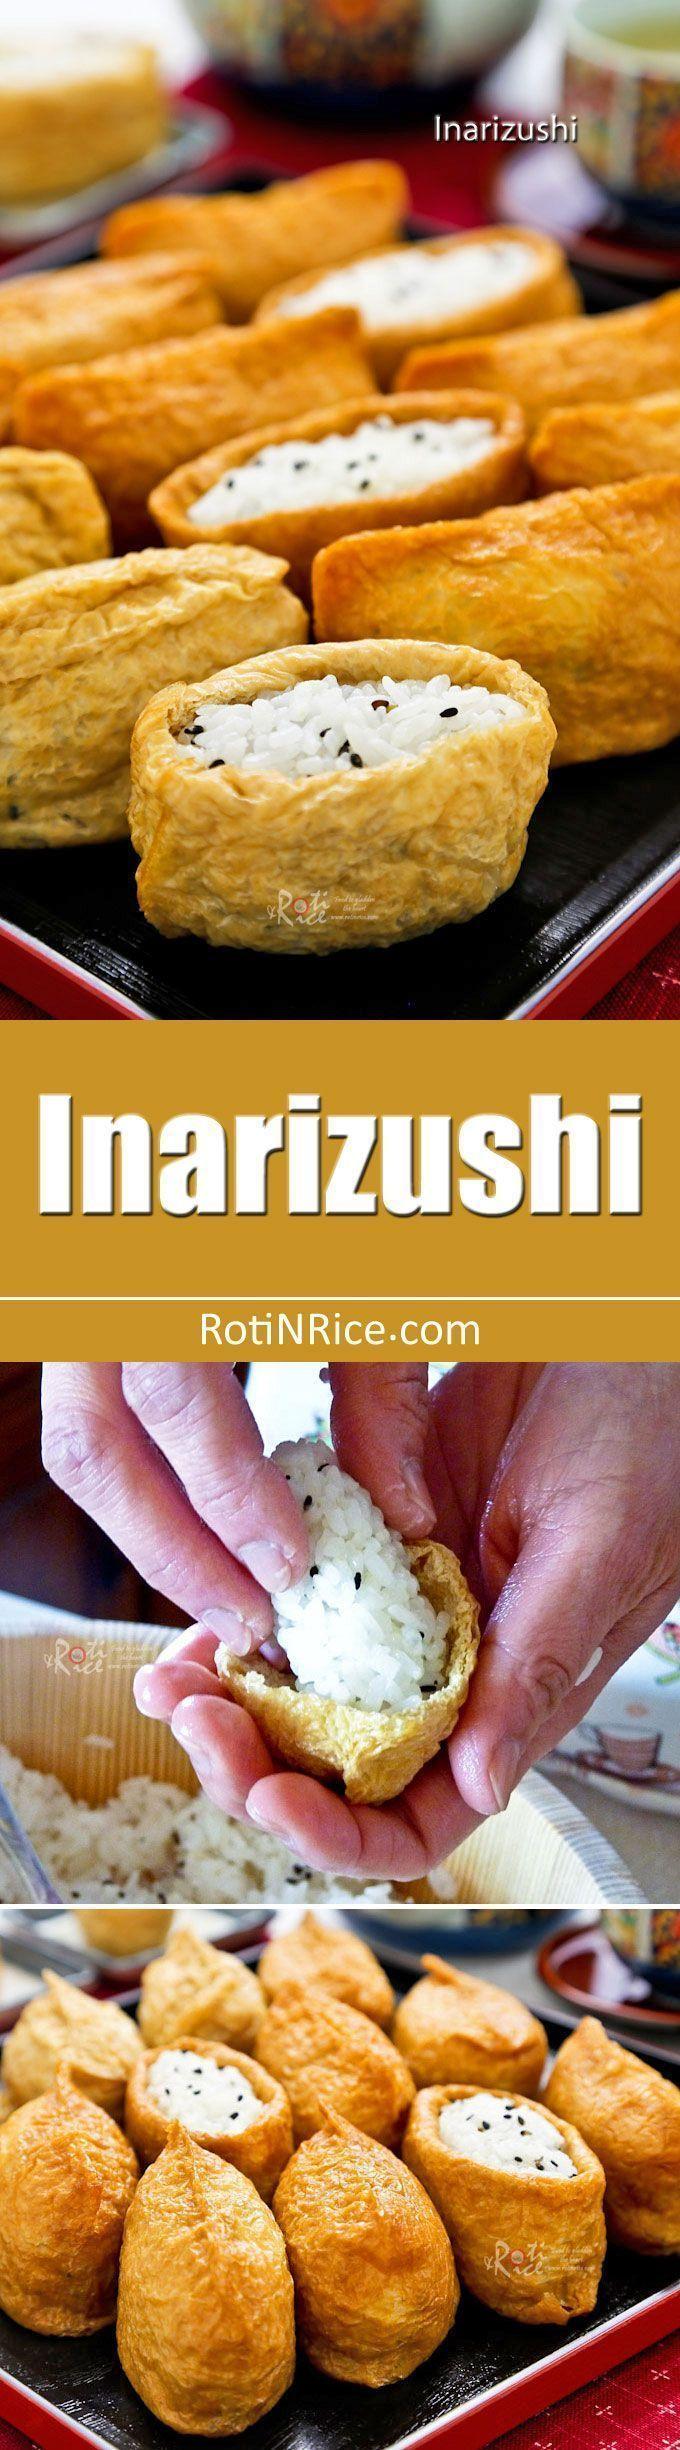 Inarizushi - sushi rice stuffed in sweet soy sauce ...